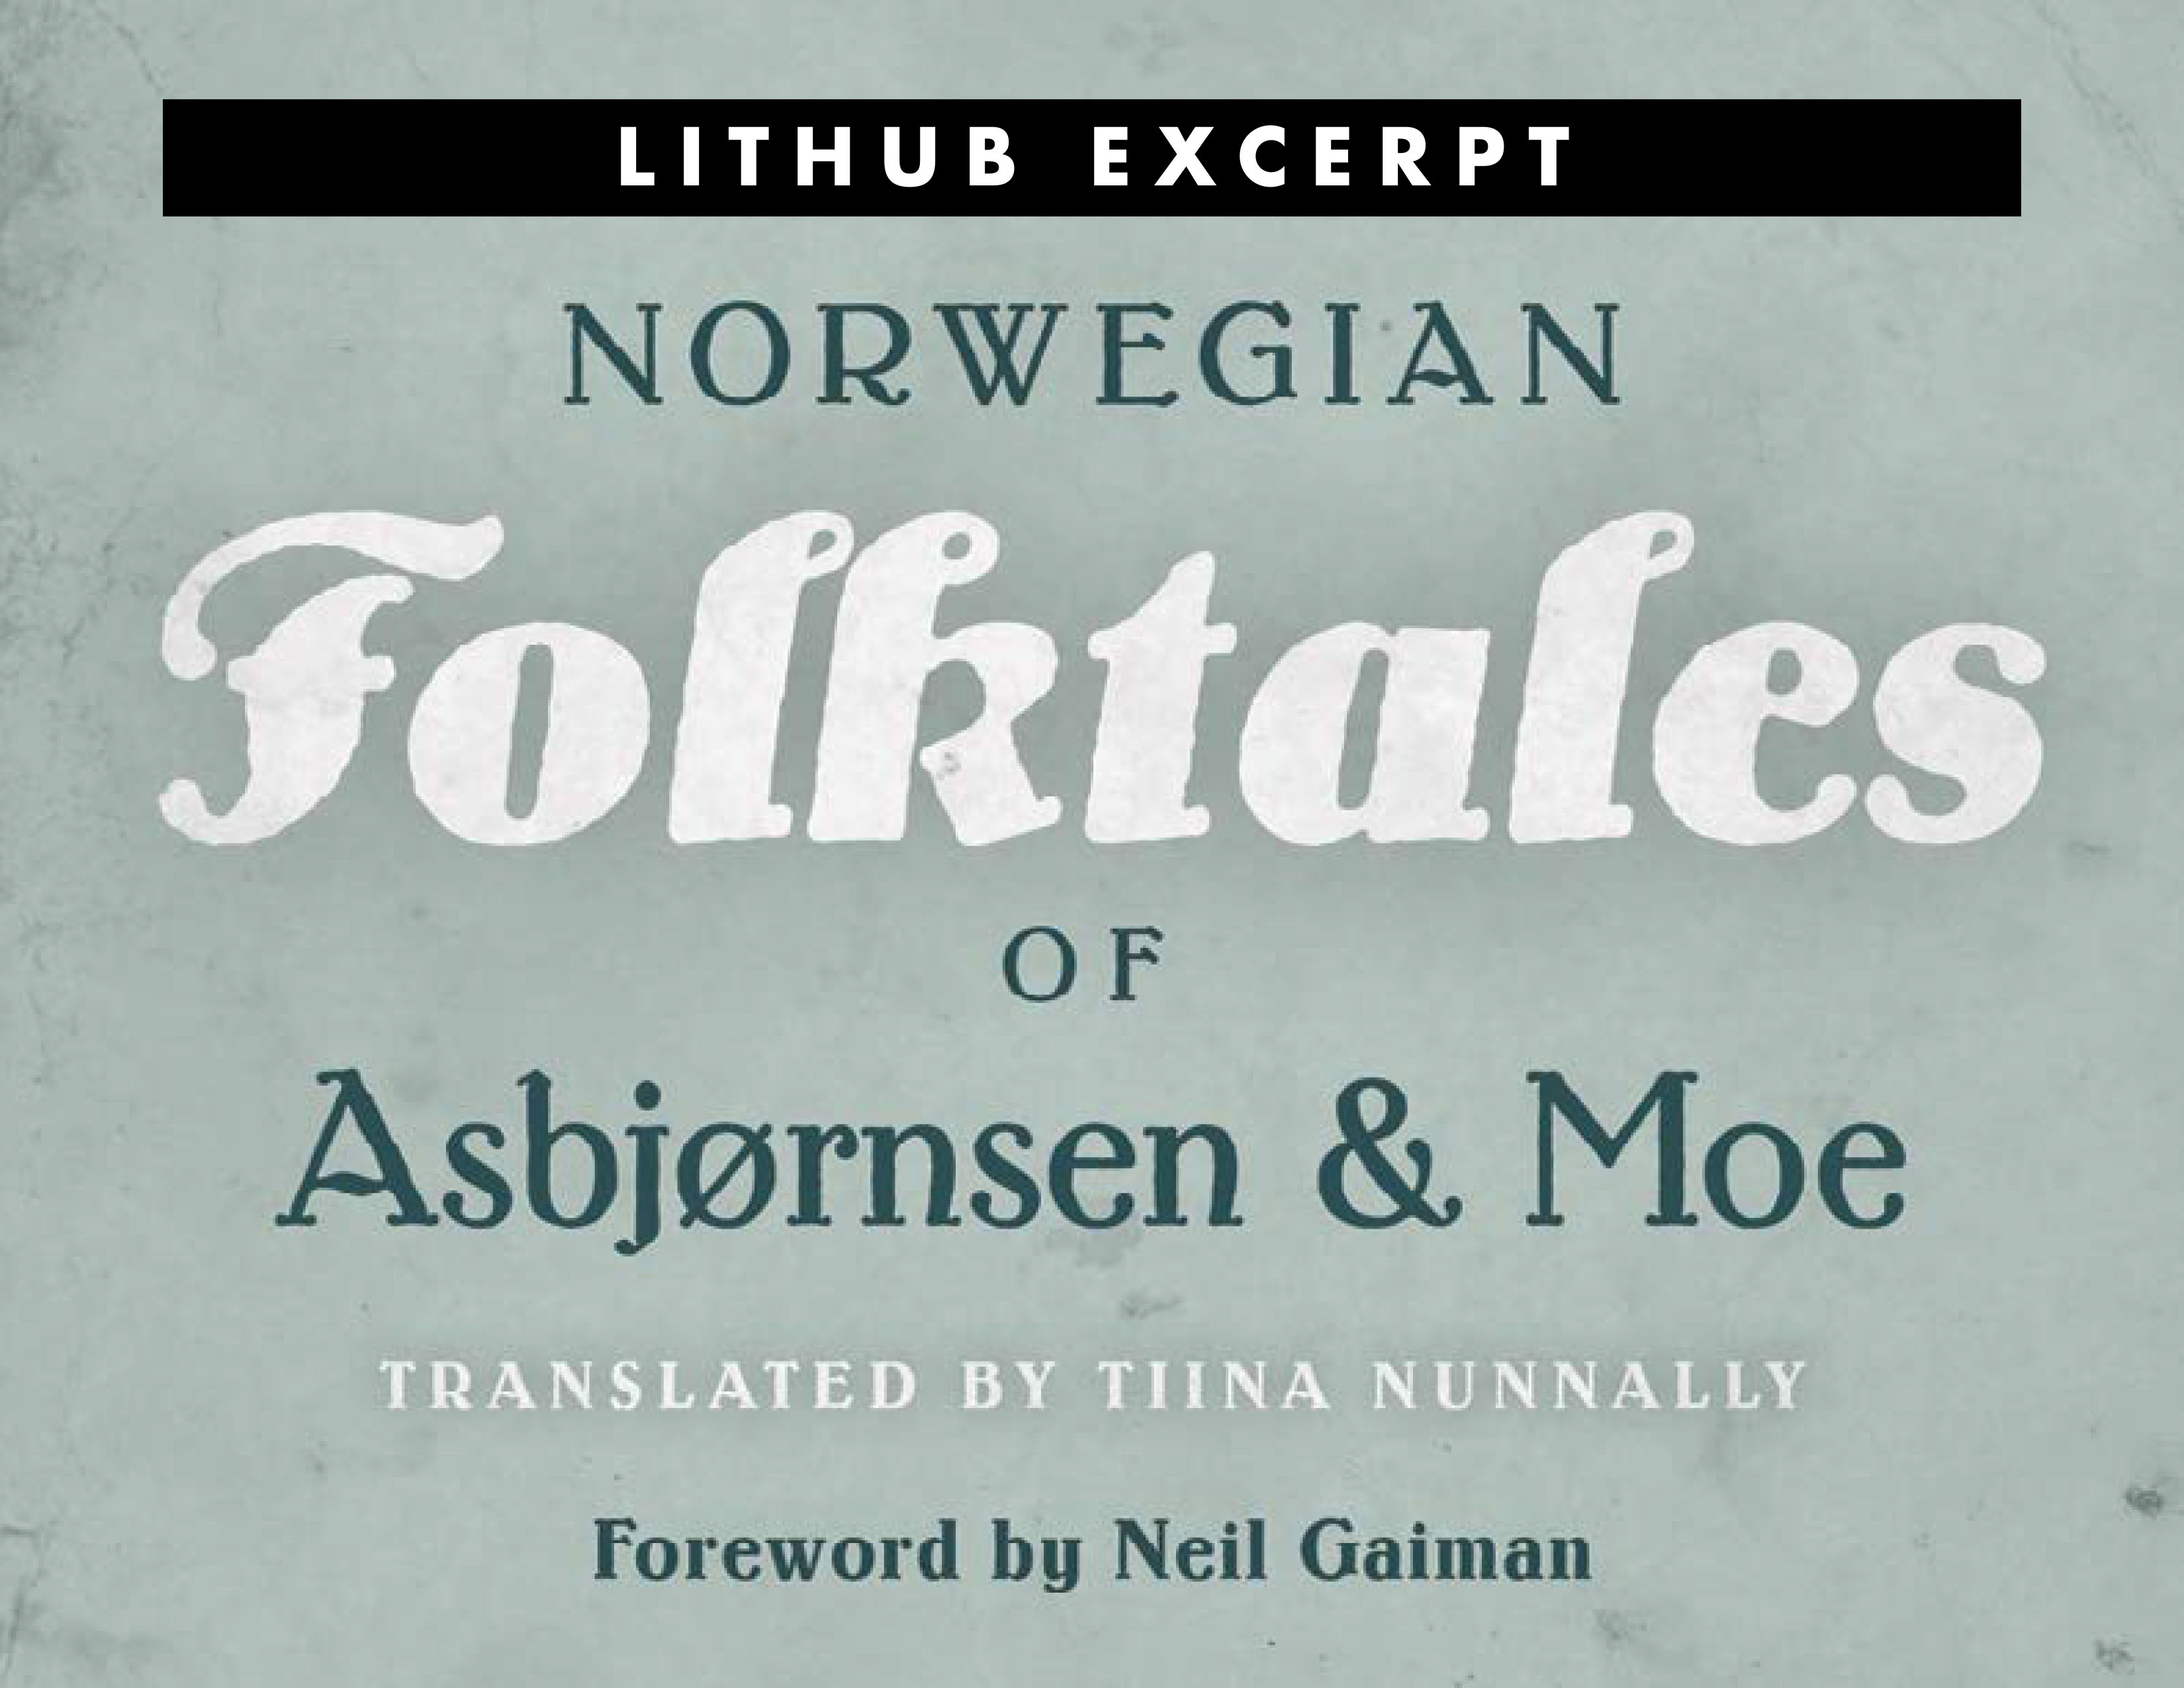 LitHub: Neil Gaiman on the Good Kinds of Trolls